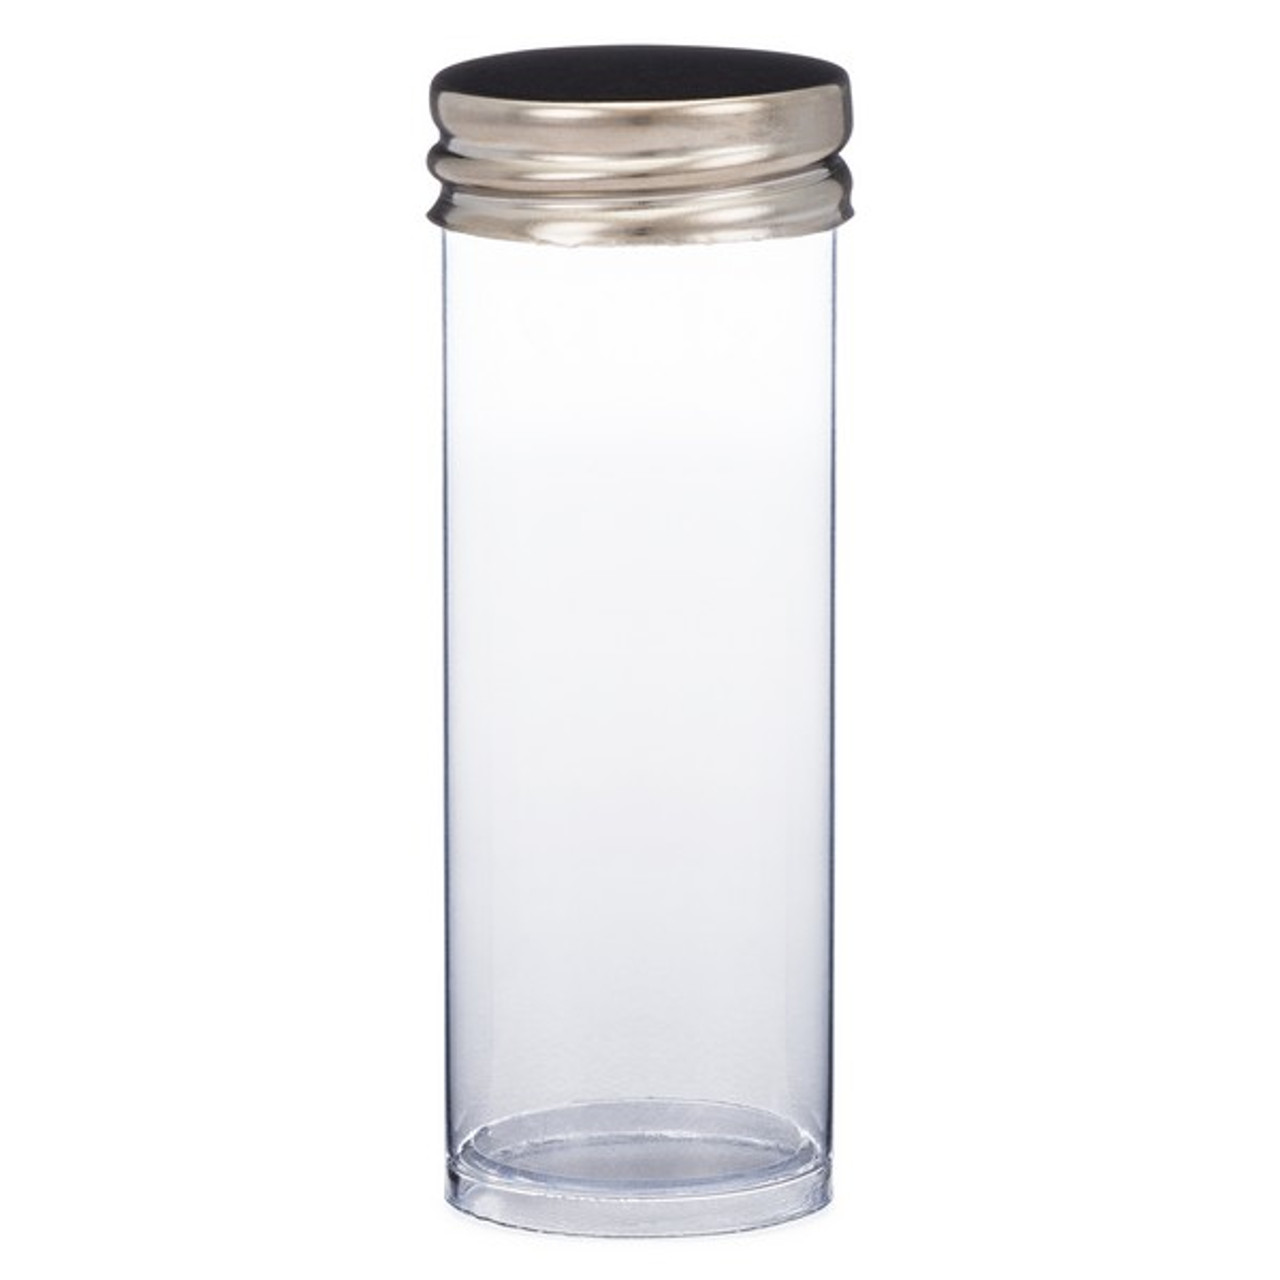 ba49cd704e38 10 Dram (37 ml) Clear Polystyrene Plastic Vials (Metal Cap) - F1249